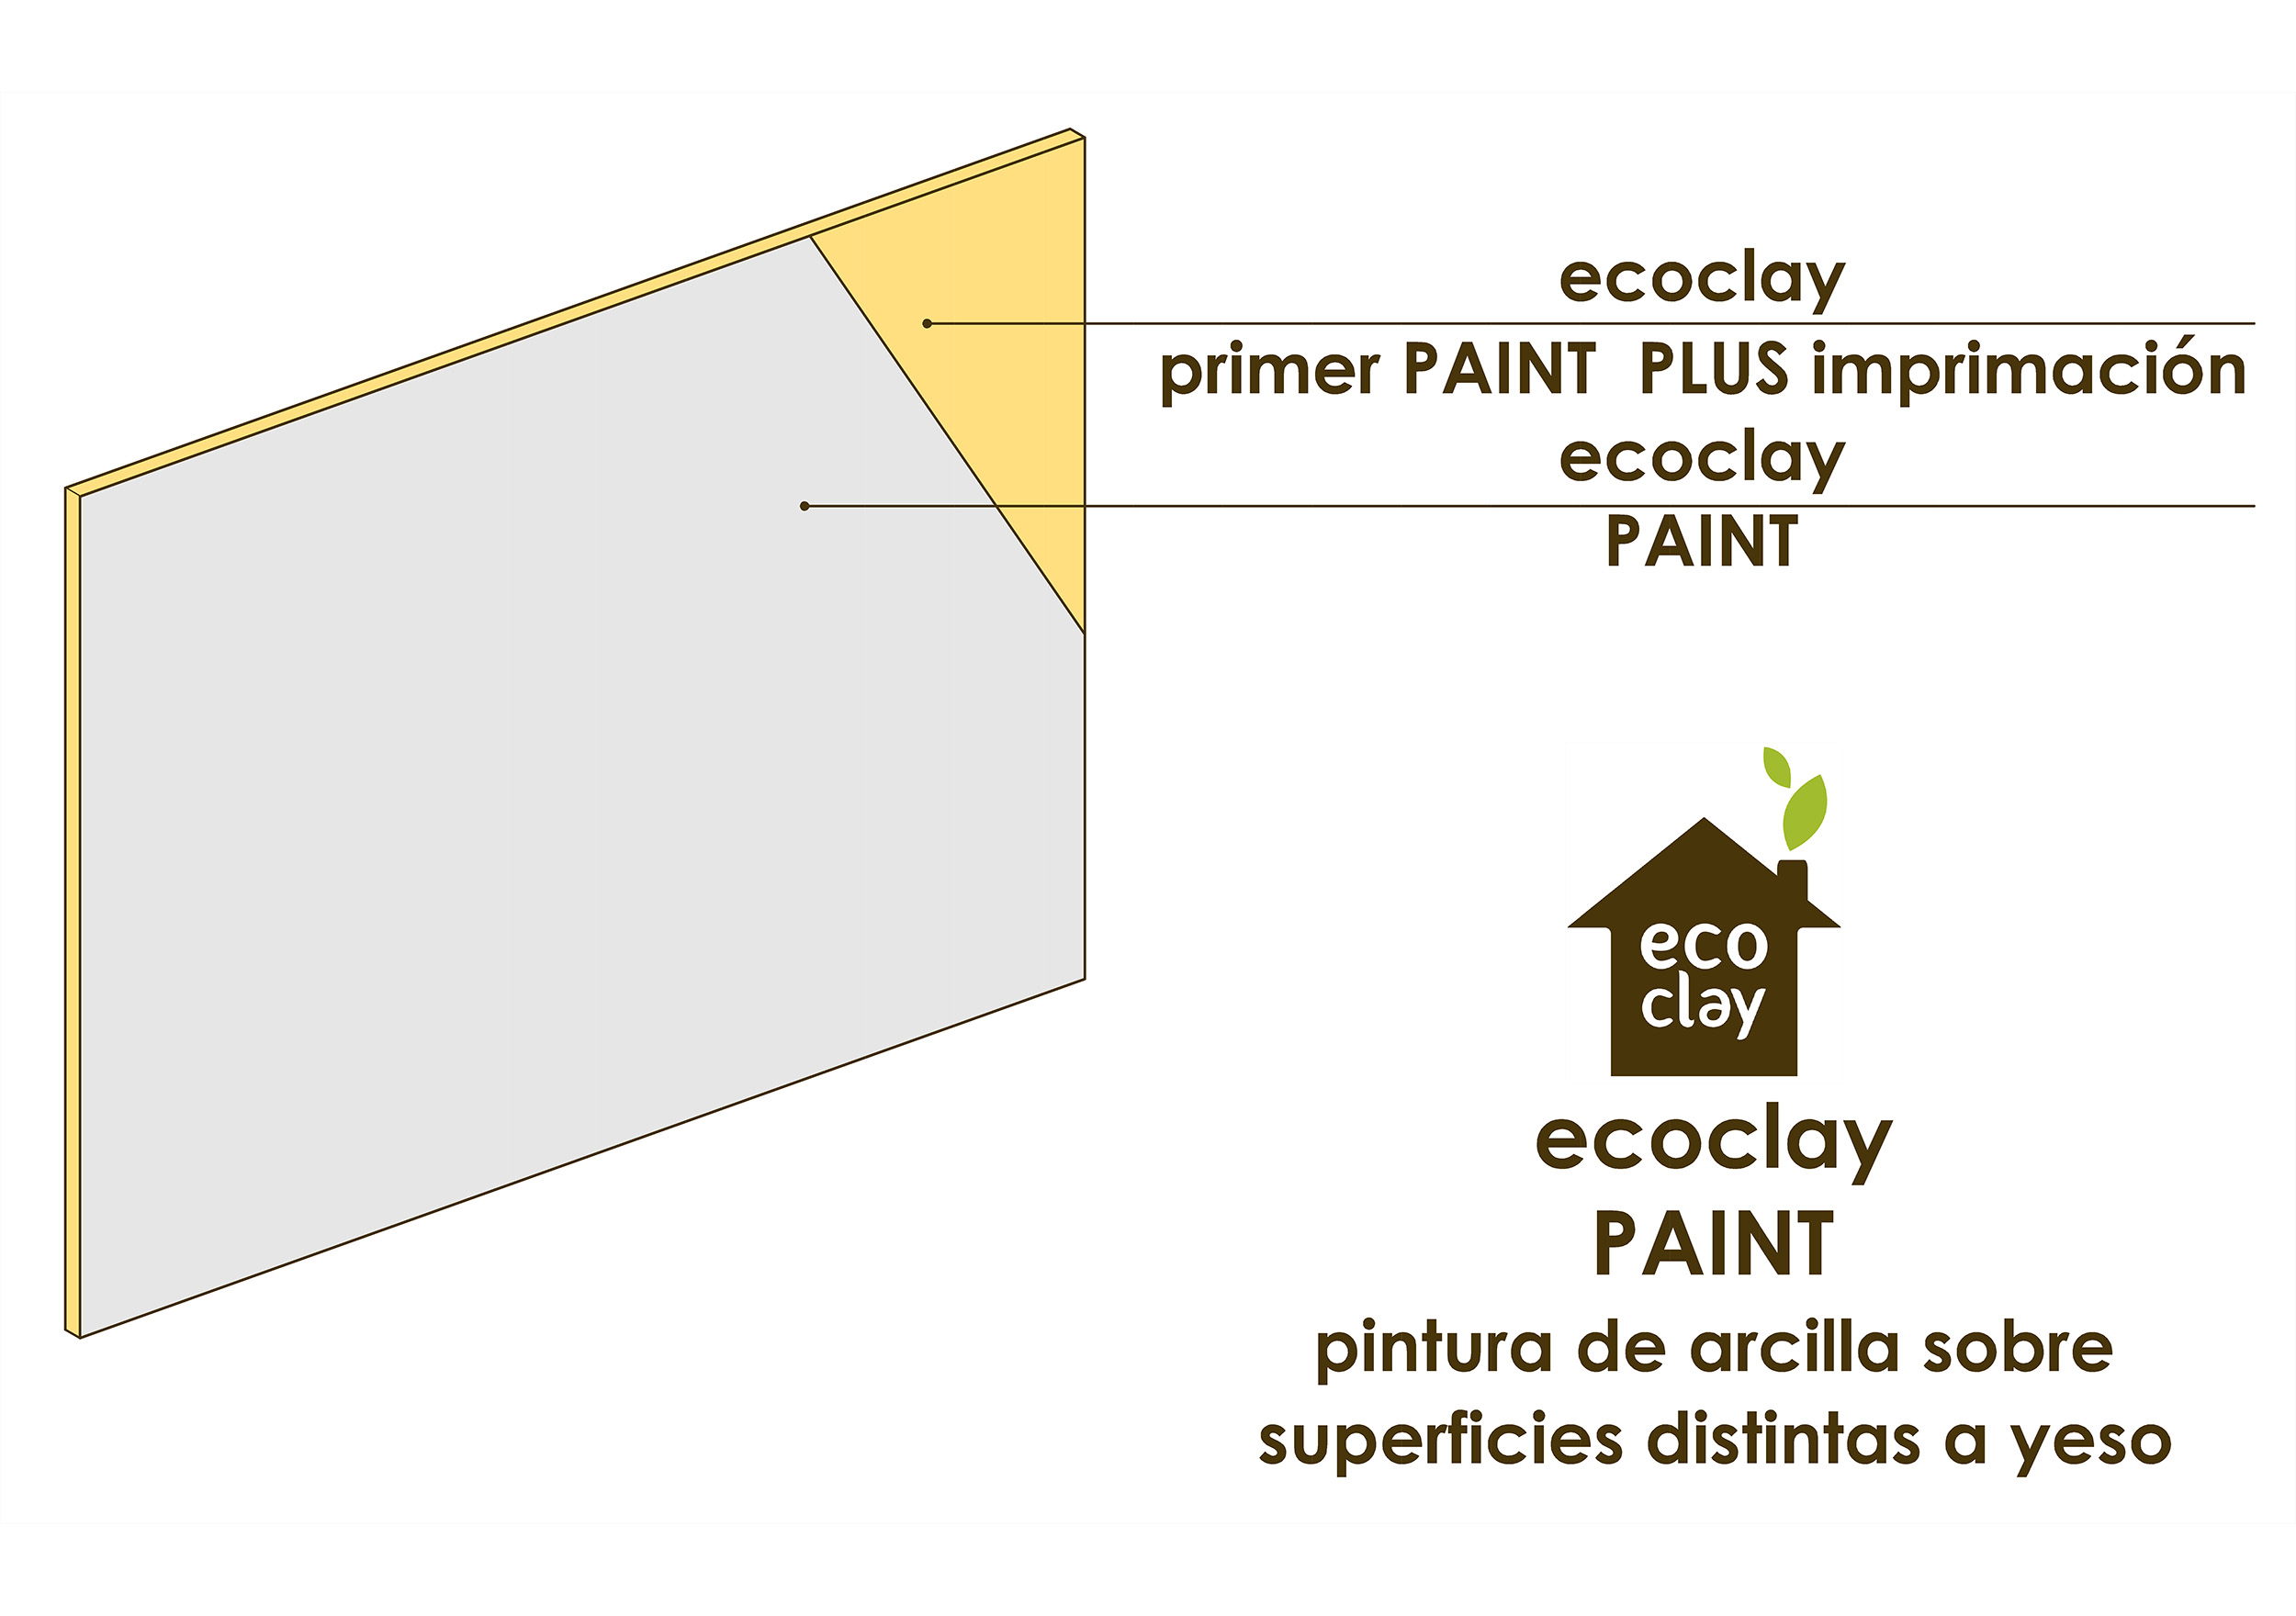 ecoclay PAINT, sobre superficie distinta al yeso